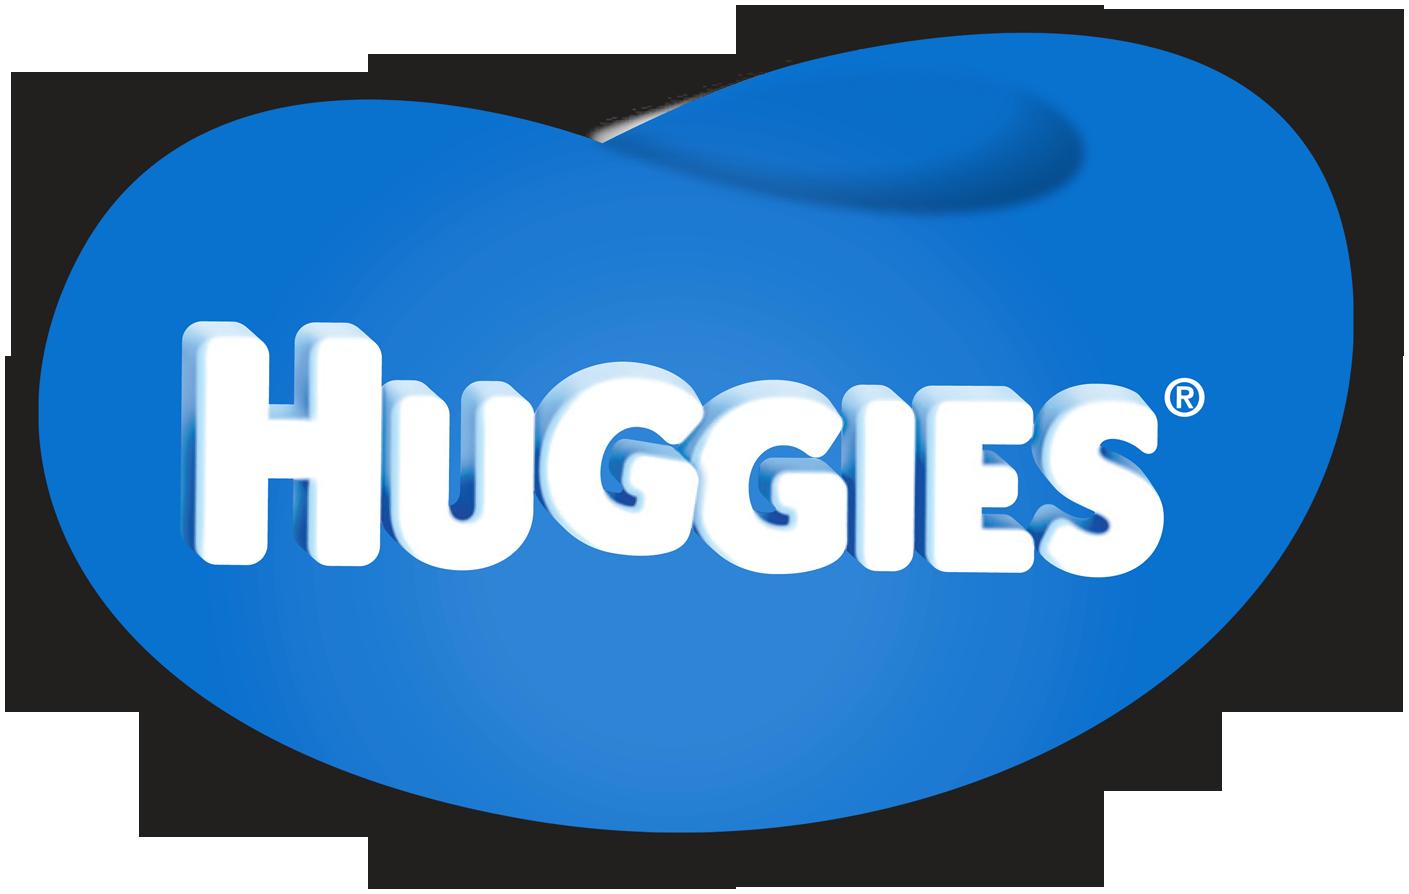 logo_huggies-60ebd46634d42.png